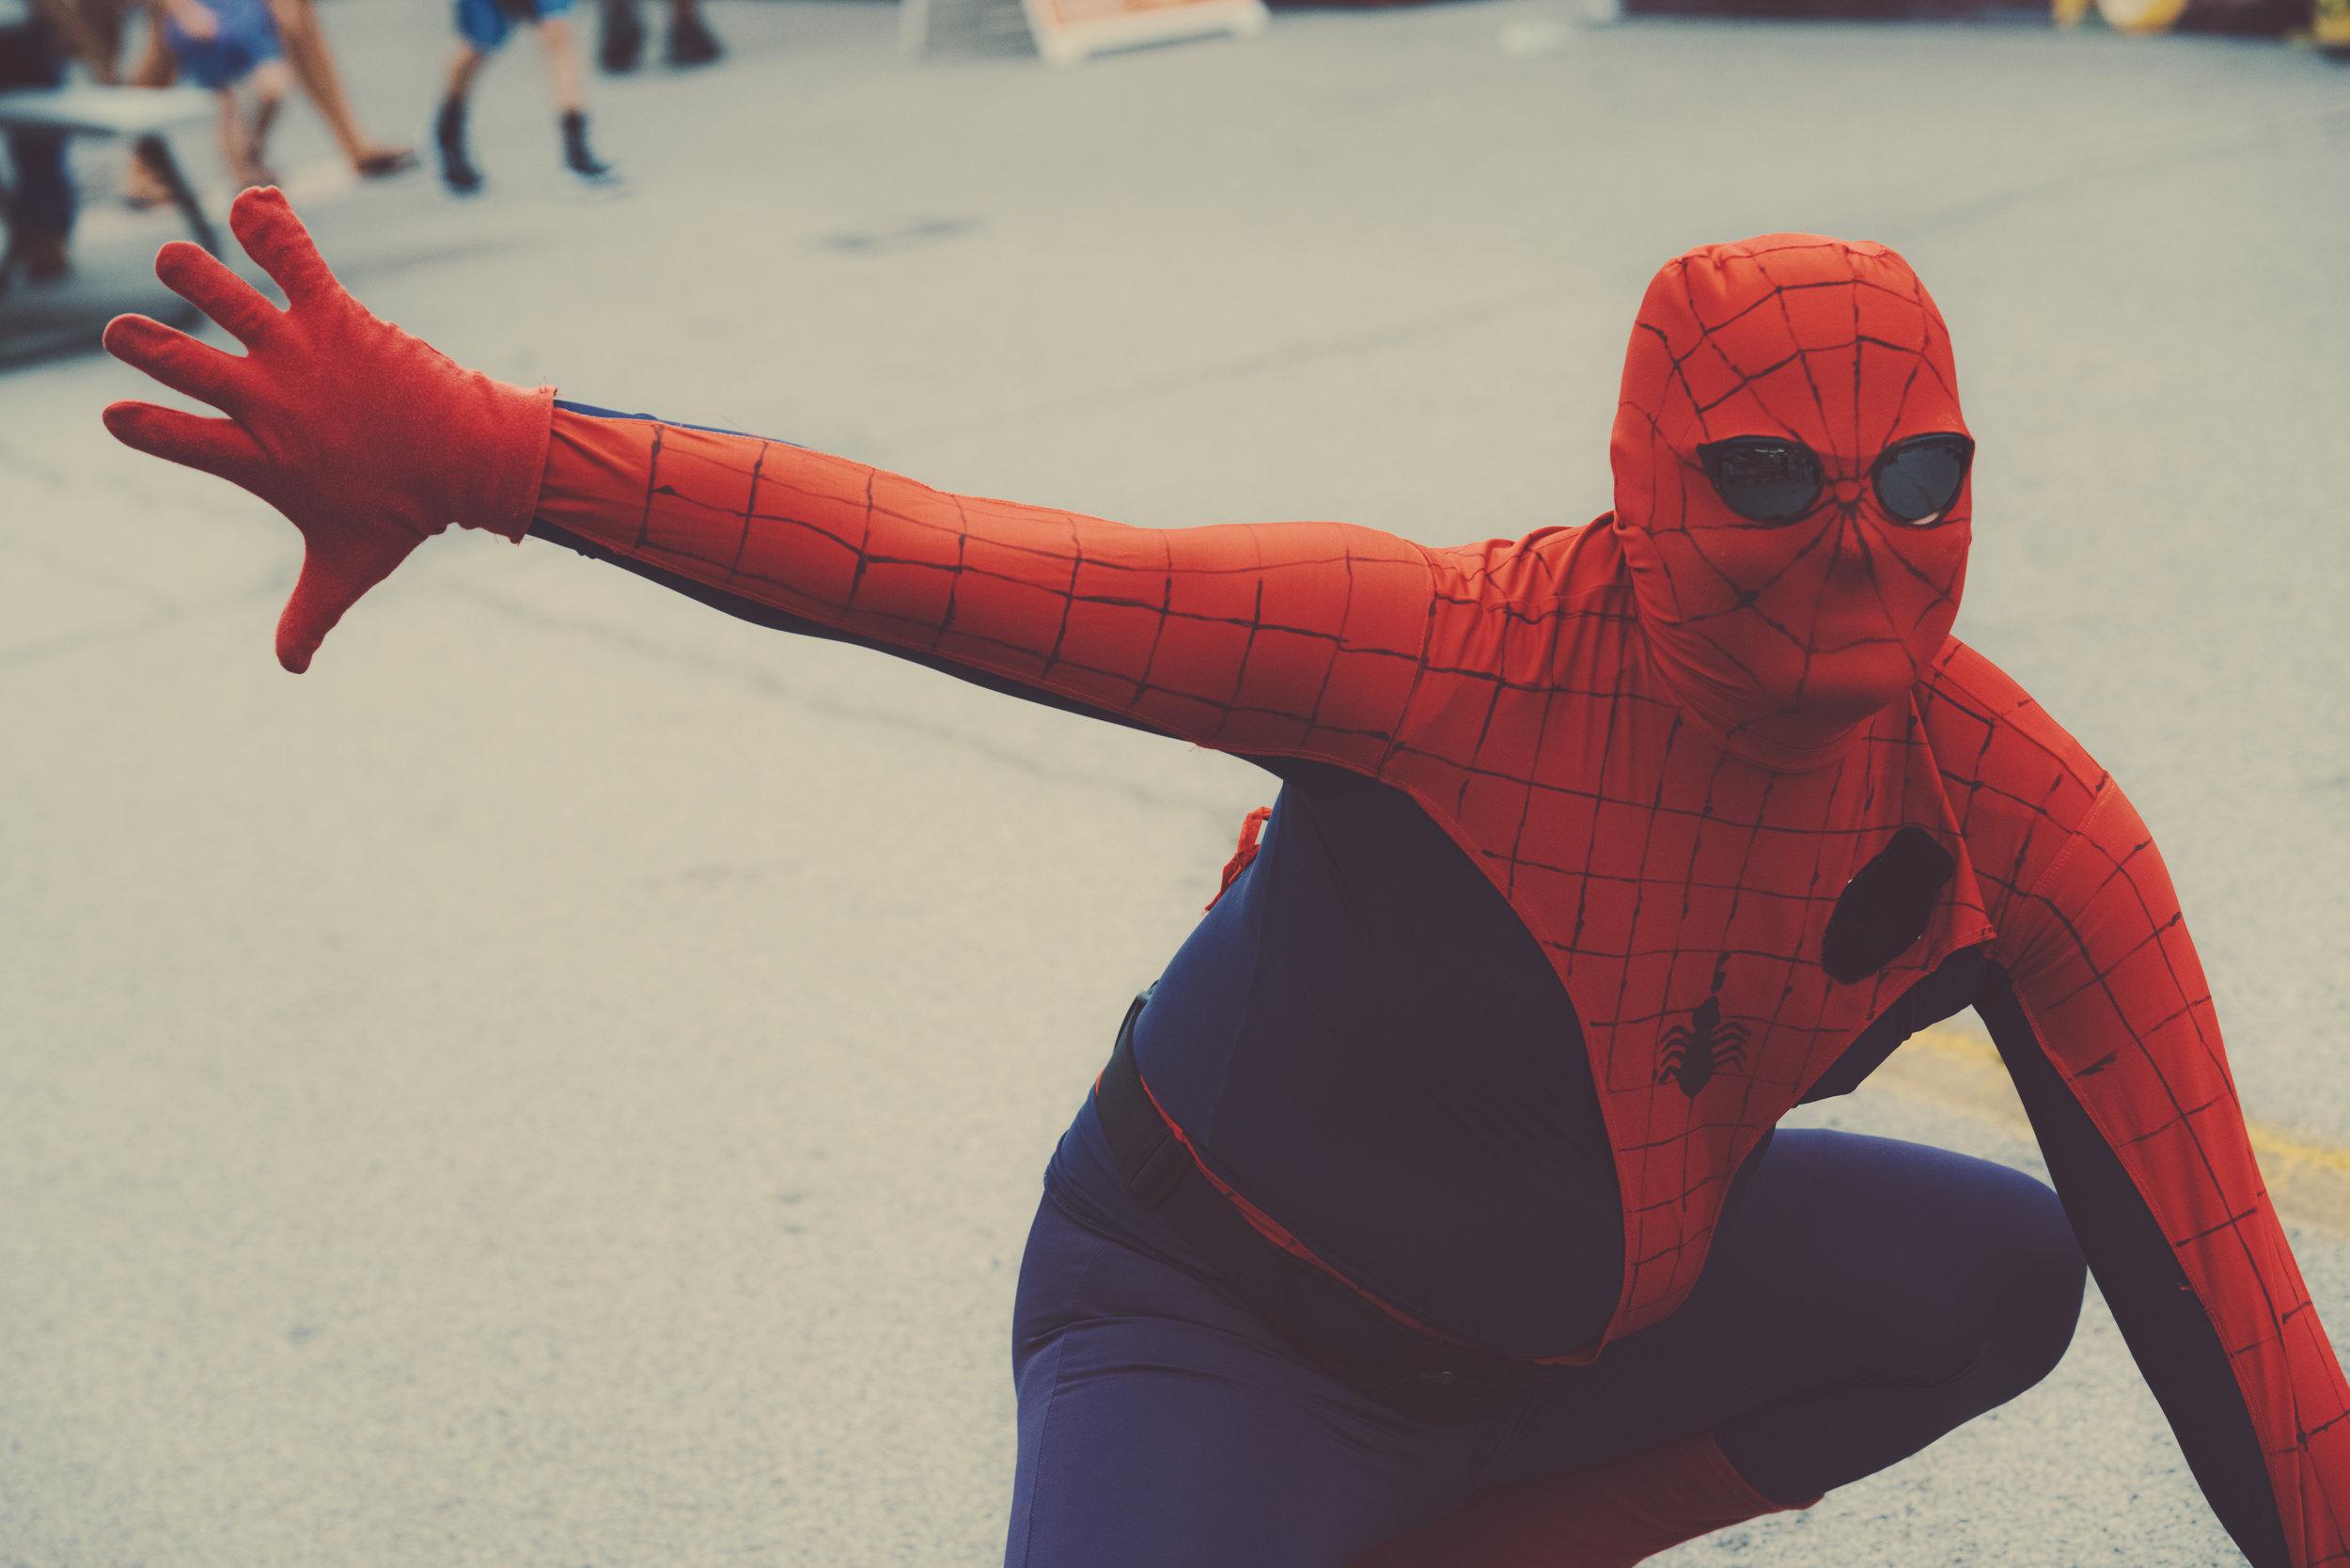 Slingin' some web